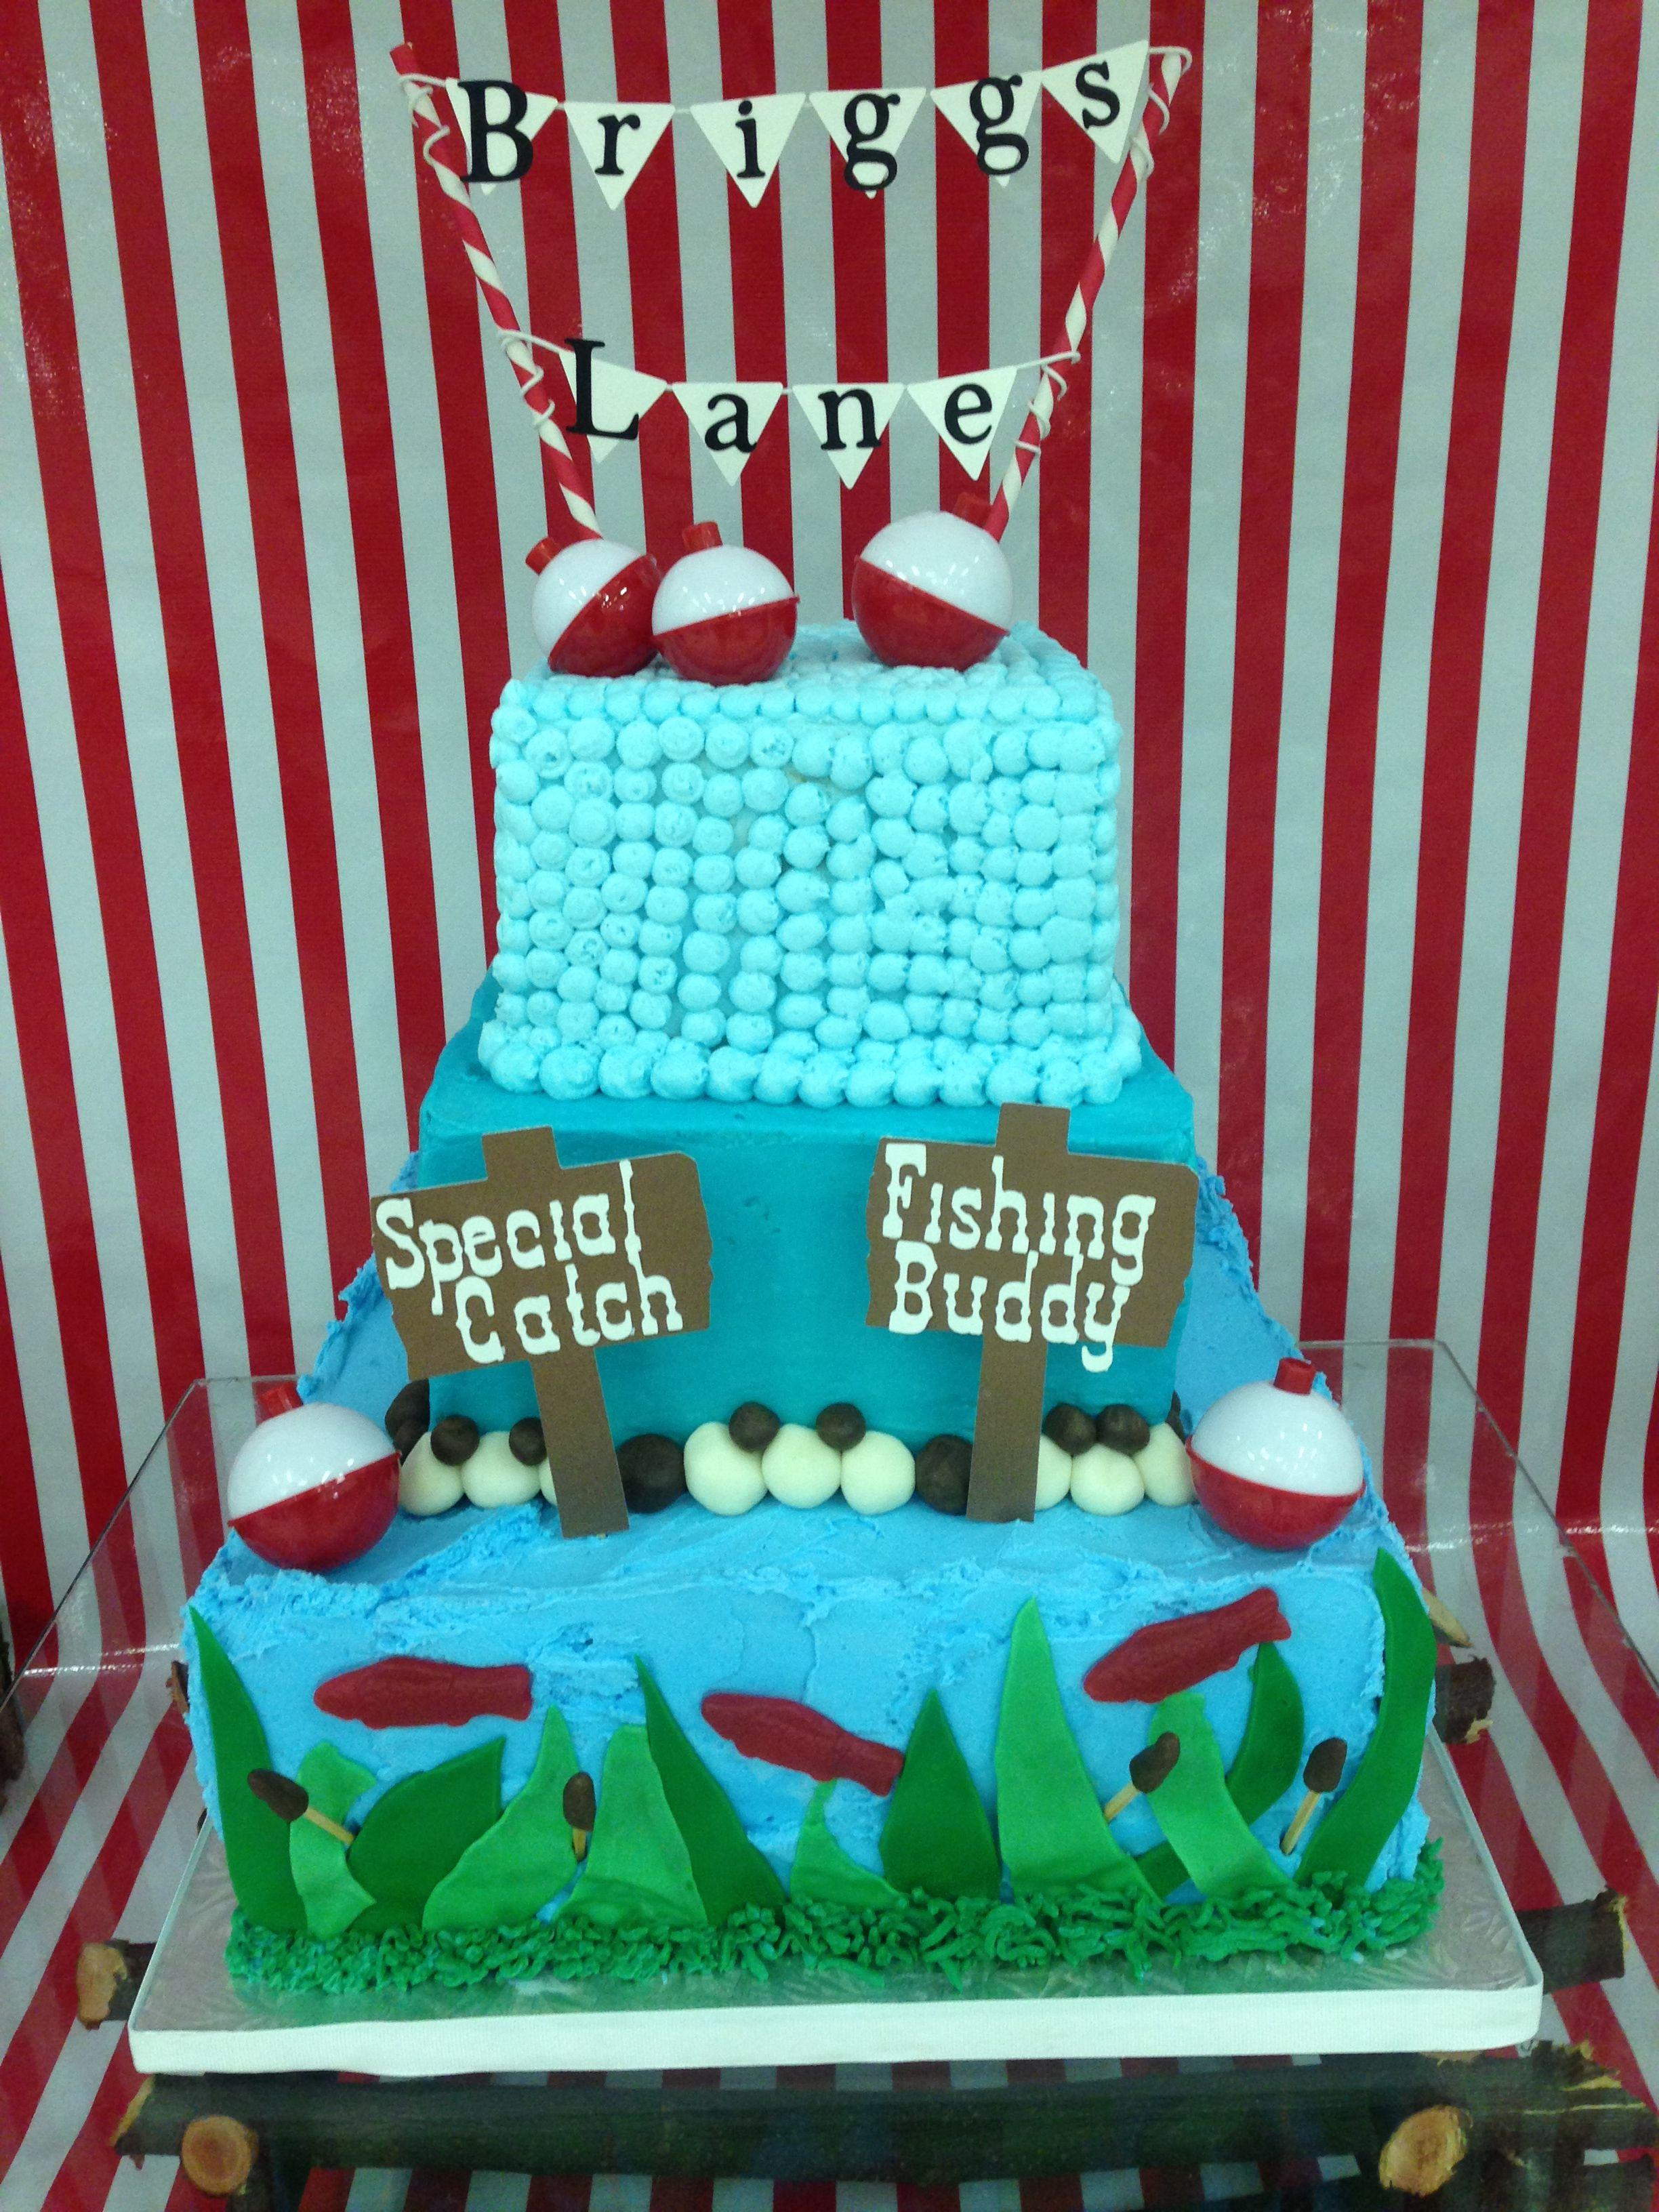 Sterling Fishing Baby Shower Me Cake Fishing Baby Shower Me Cake Baby Shower Pinterest Fishing Boy Baby Shower Mes Blogs Boy Baby Shower Mes Tumblr baby shower Boy Baby Shower Themes